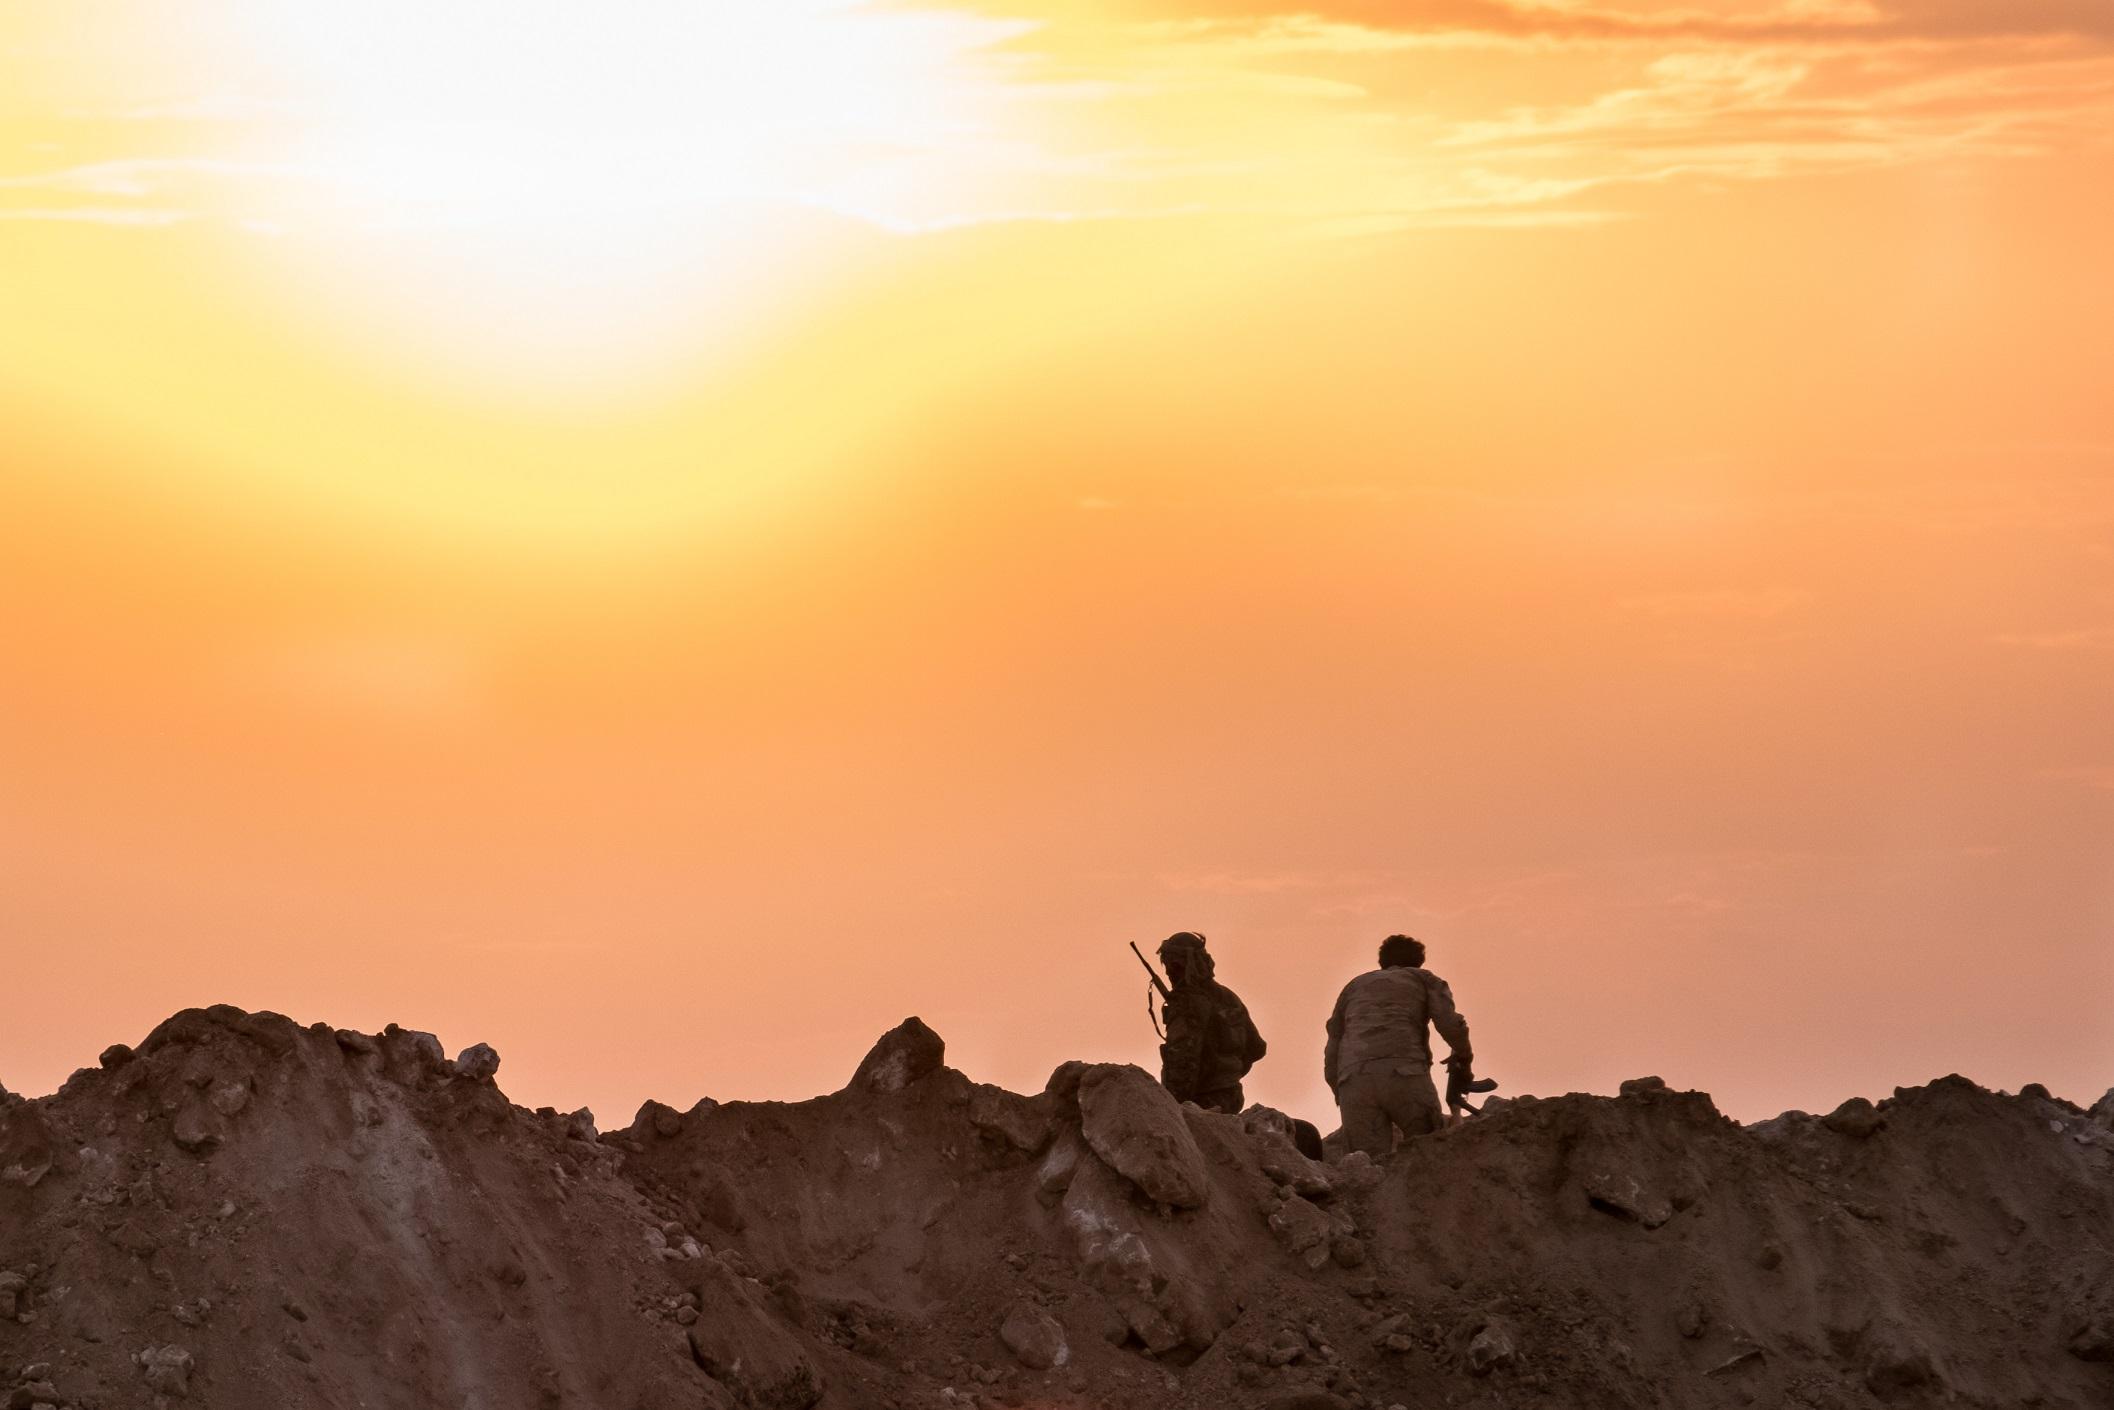 B.1.2. Baghuz Frontline - Soldats FDS.jpg